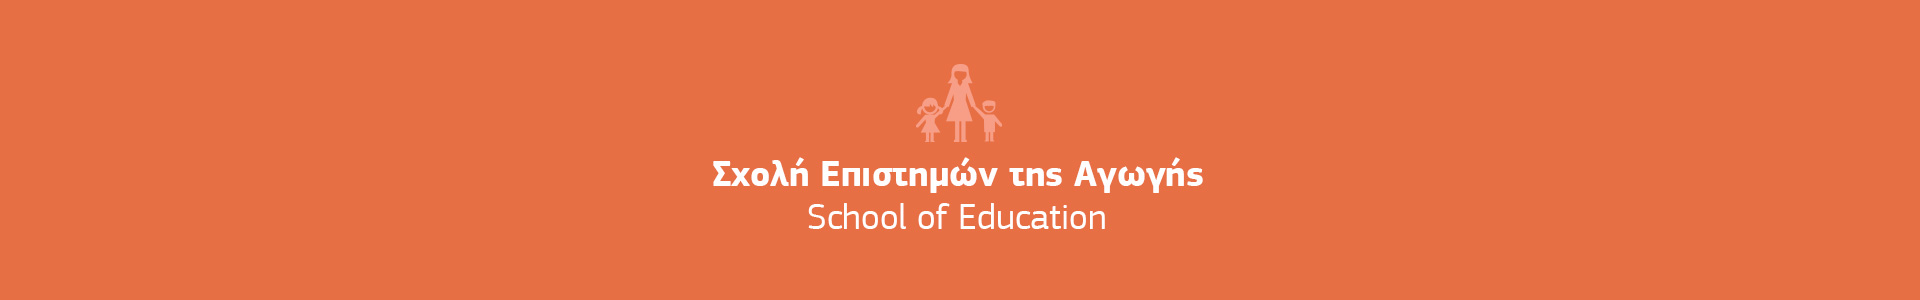 1920x300_education-school